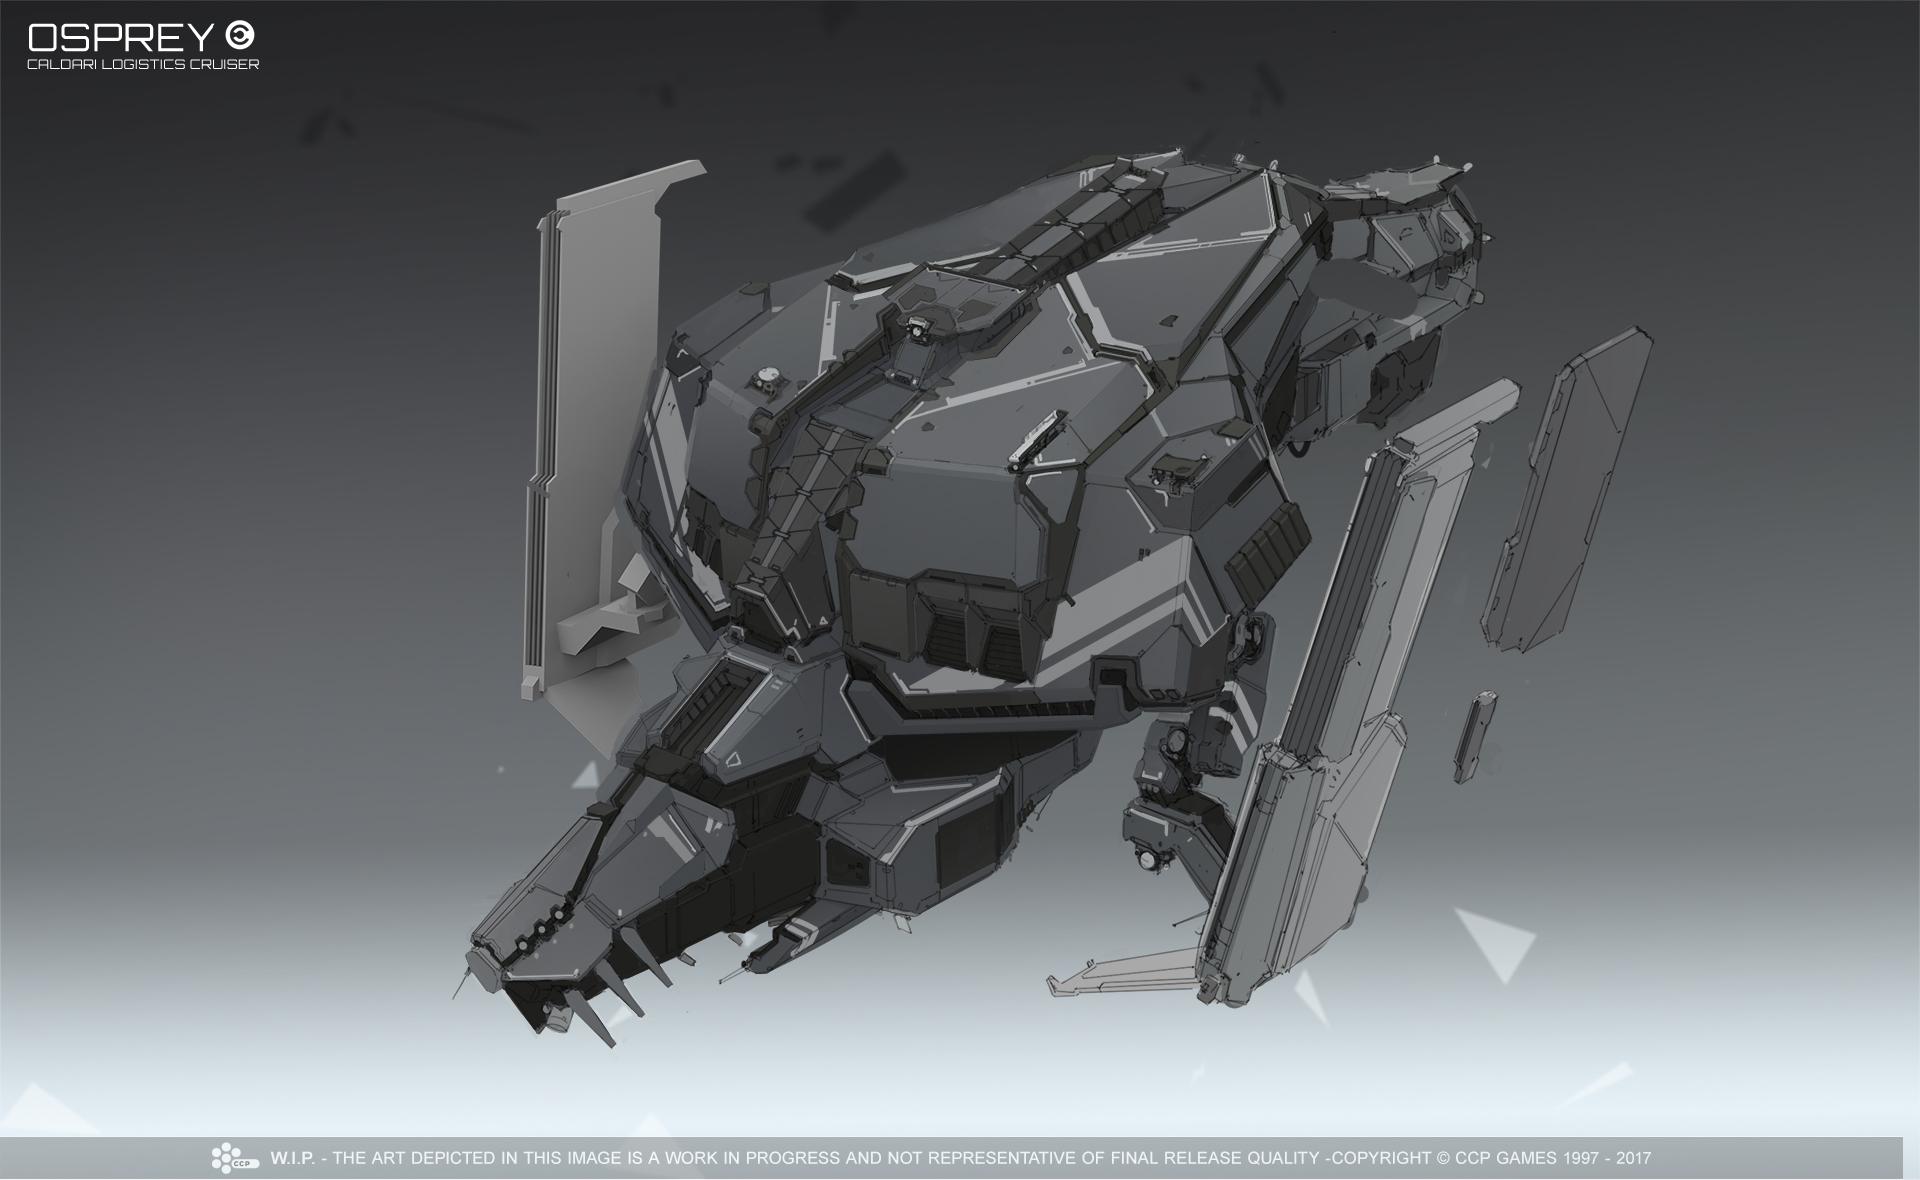 Osprey Re Design Concept Art From The Latest Development Stream Eve